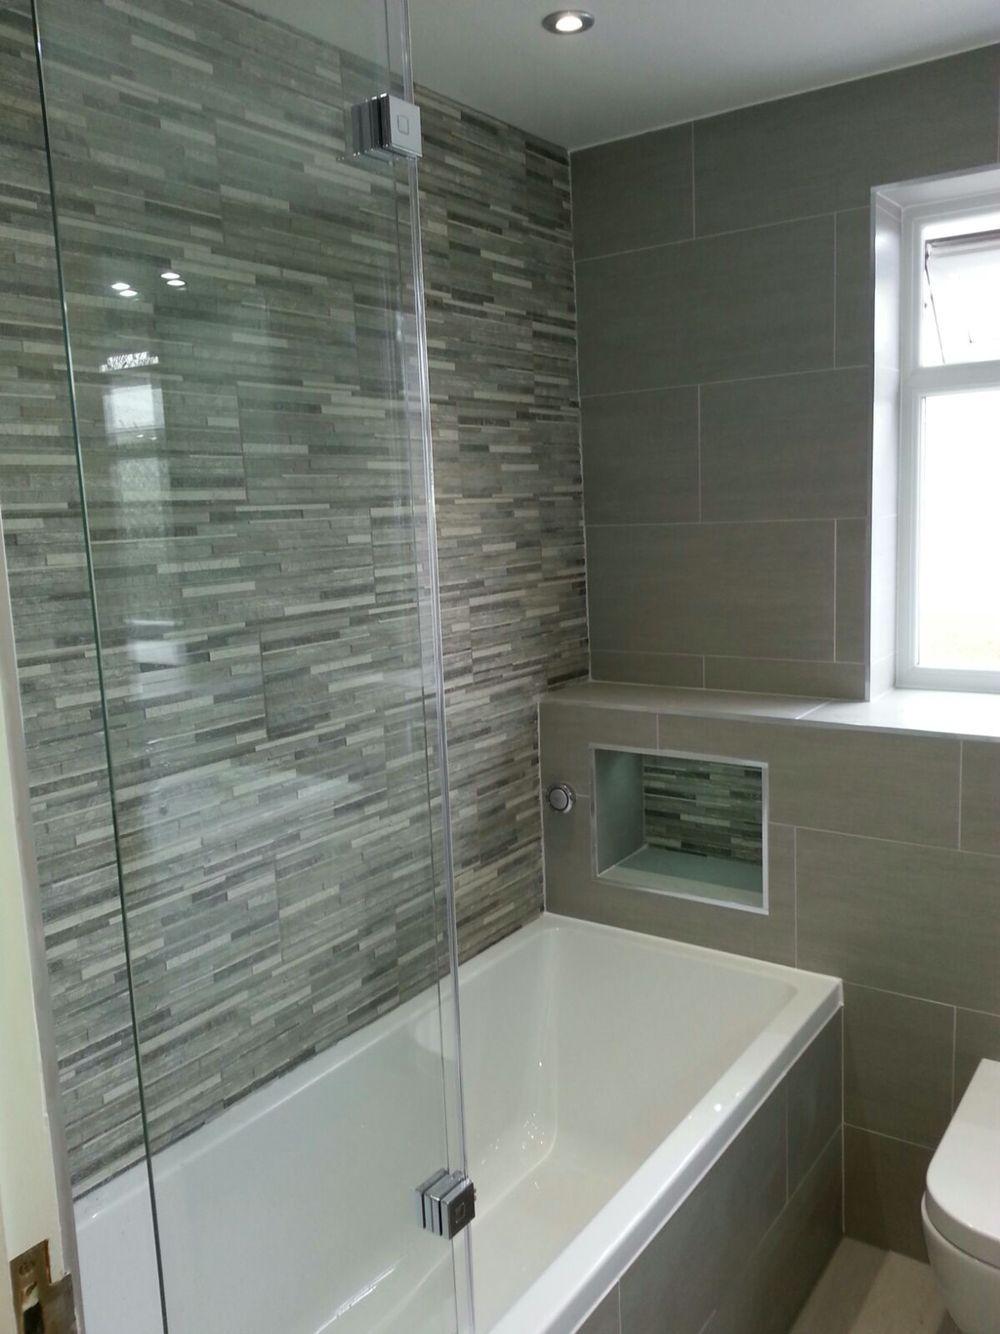 Bathroom Feature Wall Tiles Wall Hung Bathroom Feature Wall Small Bathroom Remodel Small Bathroom Makeover